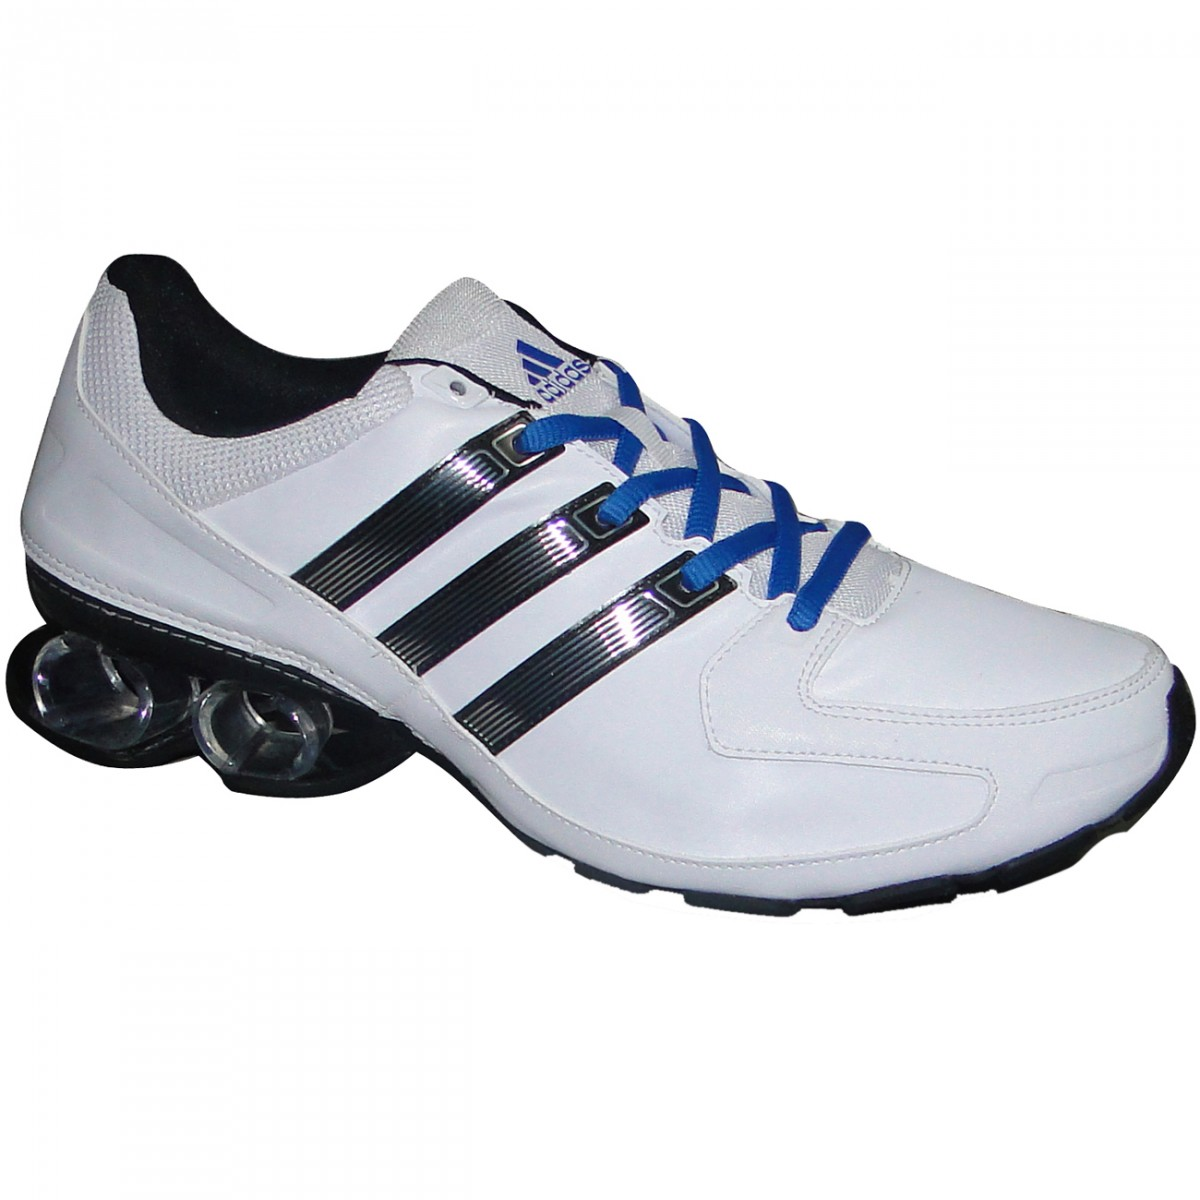 023fb97f9b2 Tenis Adidas Komet Q34320 - Branco Preto Azul - Chuteira Nike ...